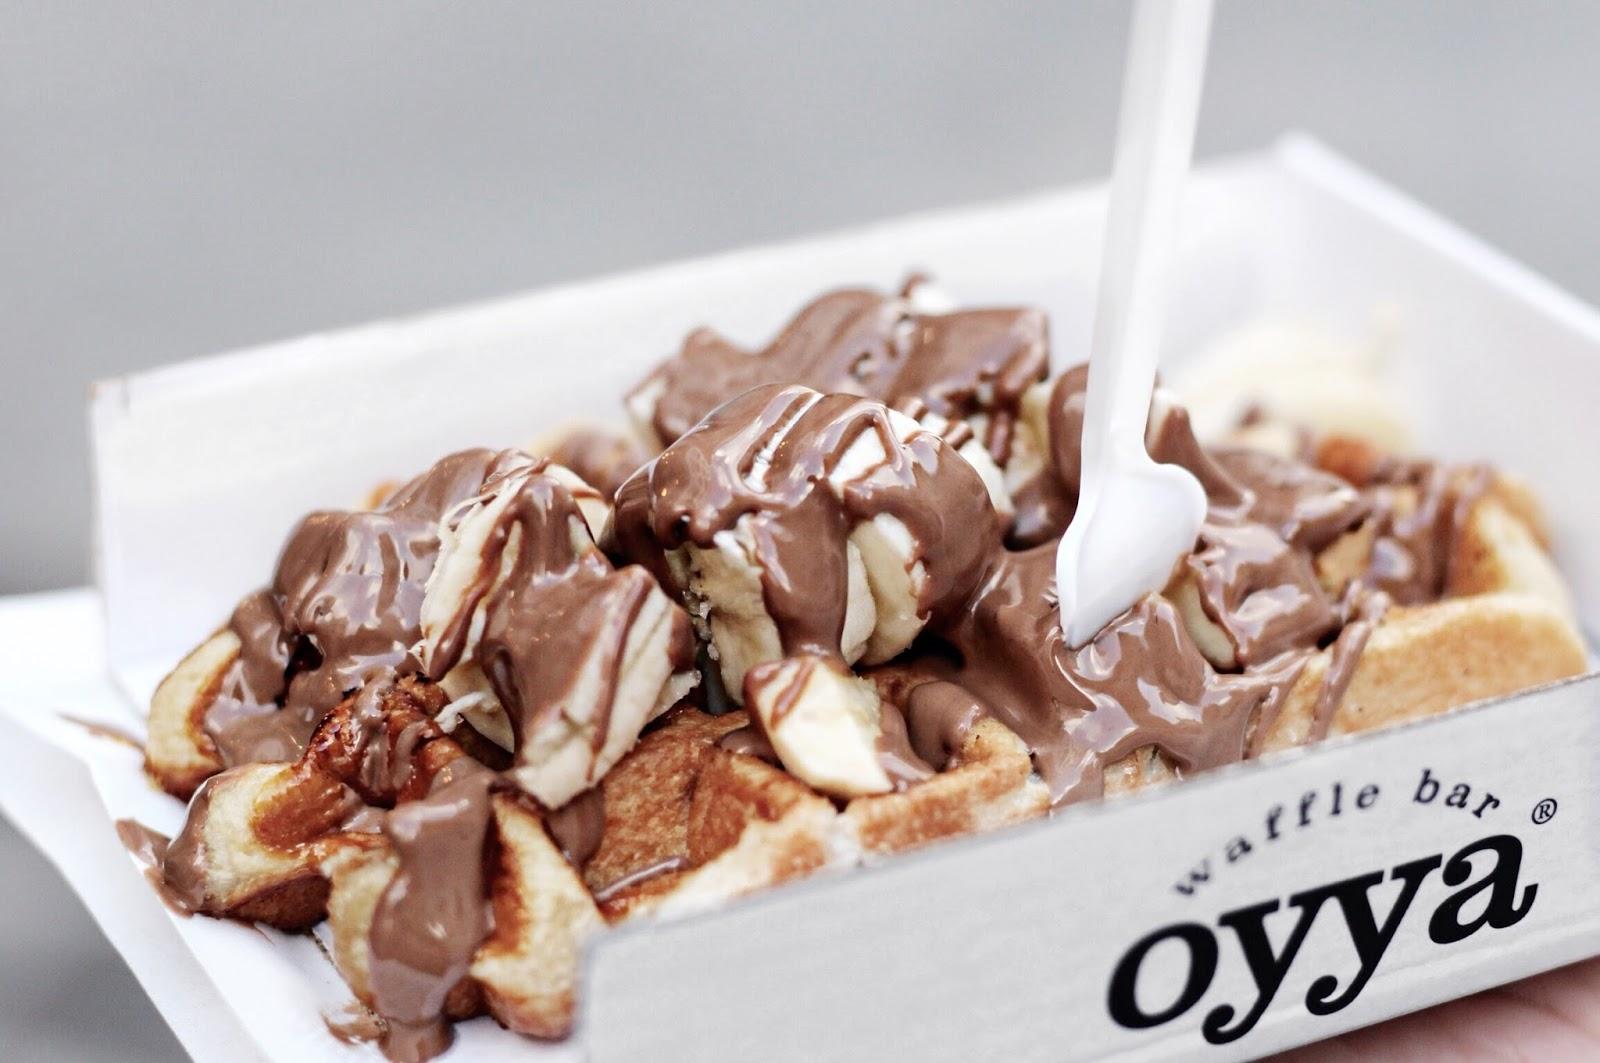 Oyya Chocolate and Banana Waffle